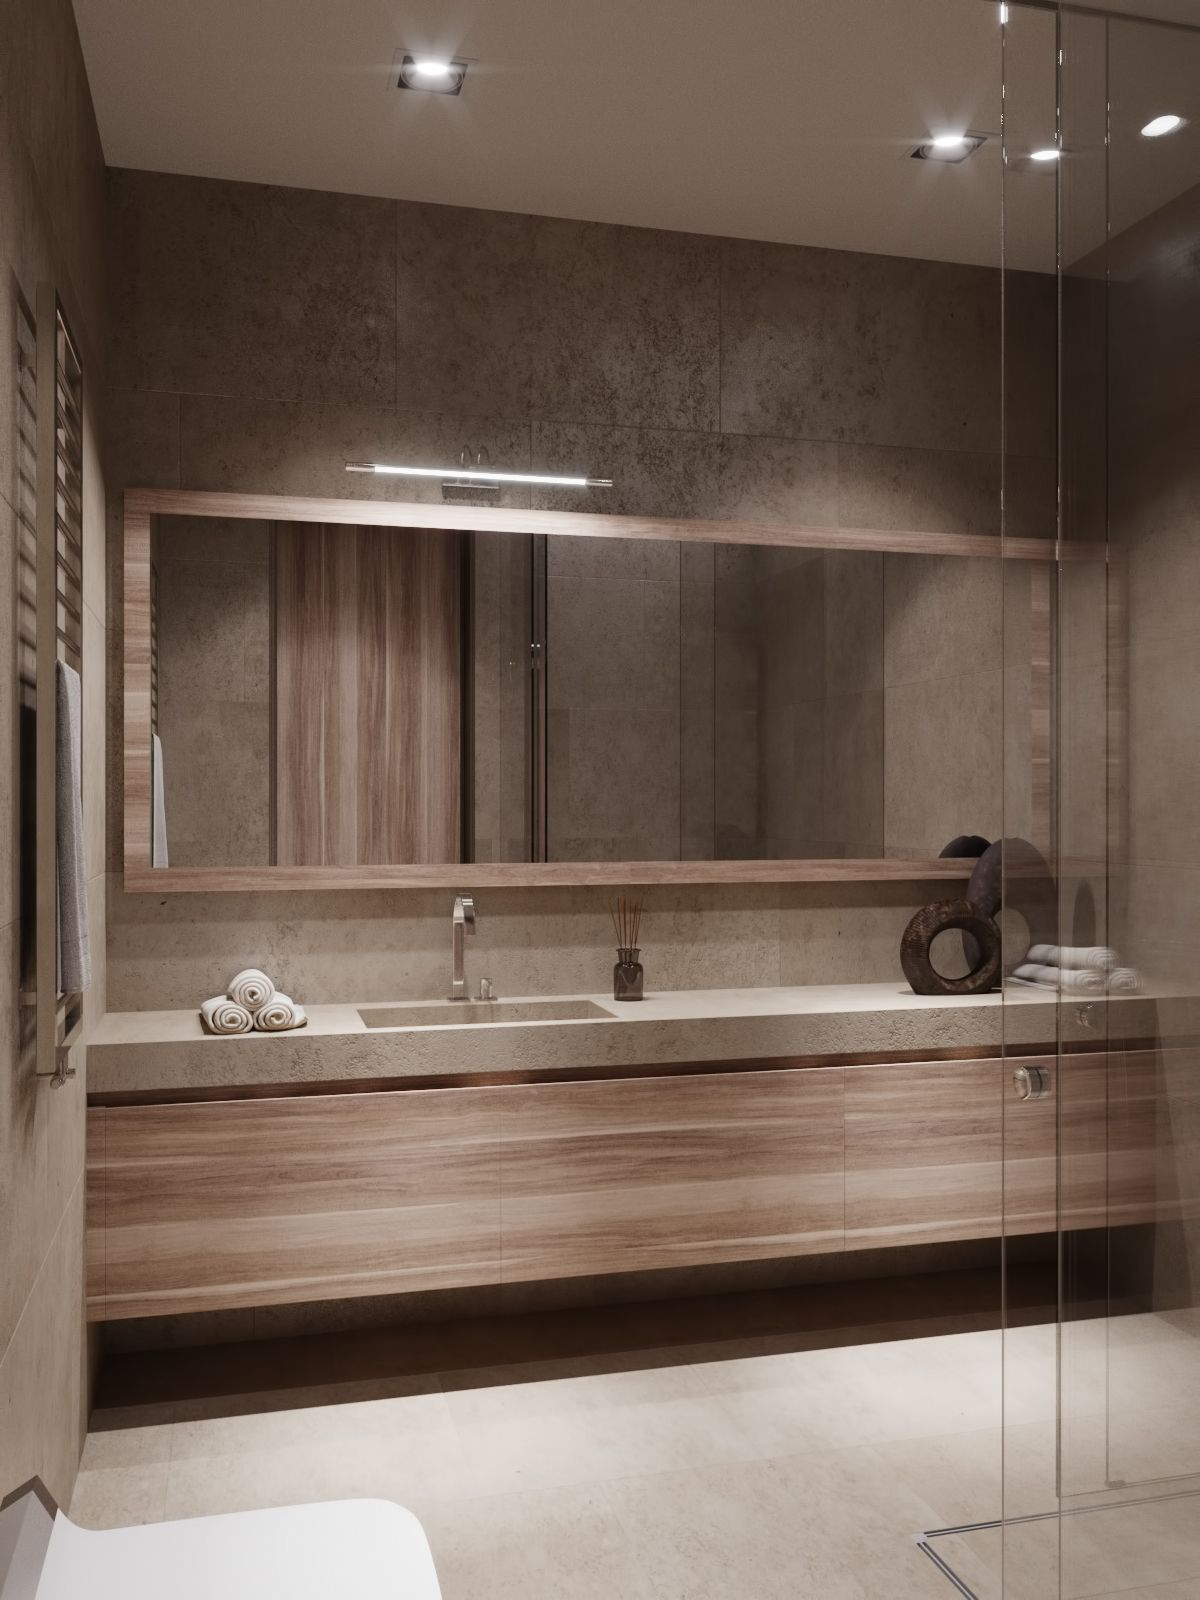 Top Project By Kurilov Design In 2020 Hotel Room Design Diy Bathroom Makeover Bathroom Decor Apartment